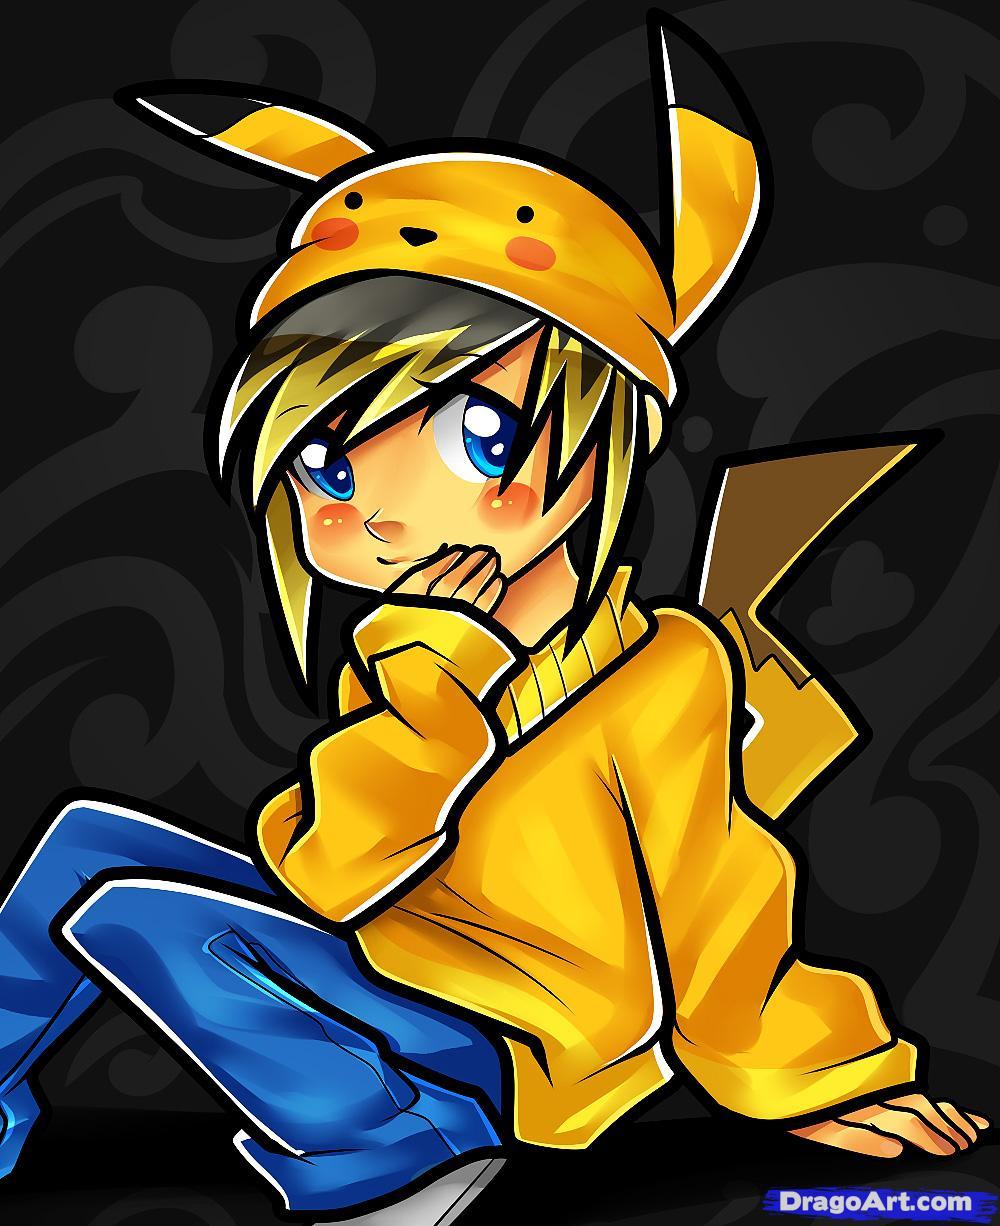 Drawn pikachu anime Step Human to  how